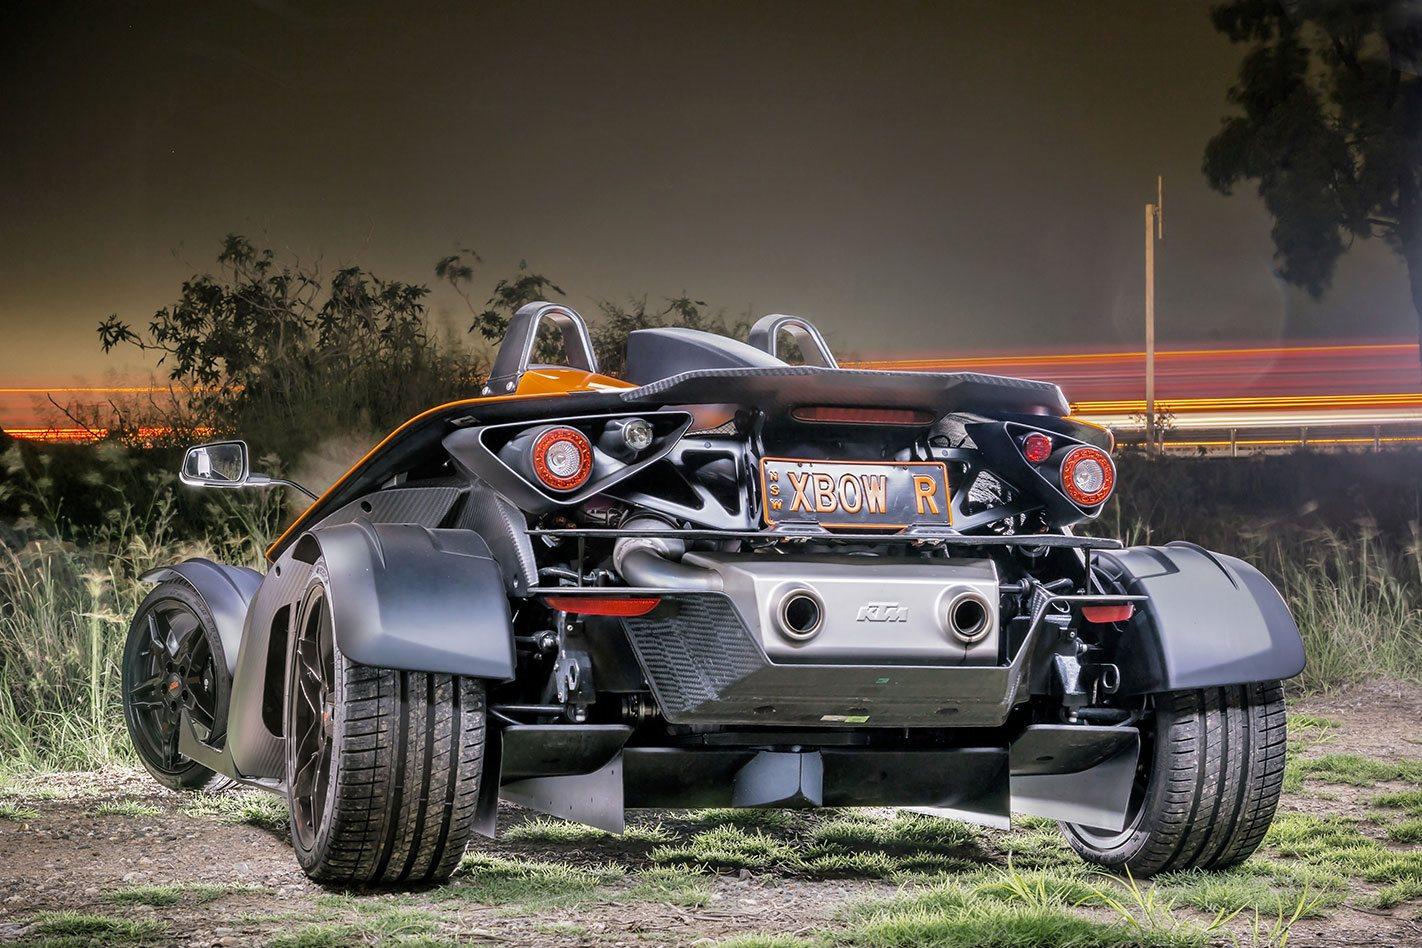 KTM X-BOW rear